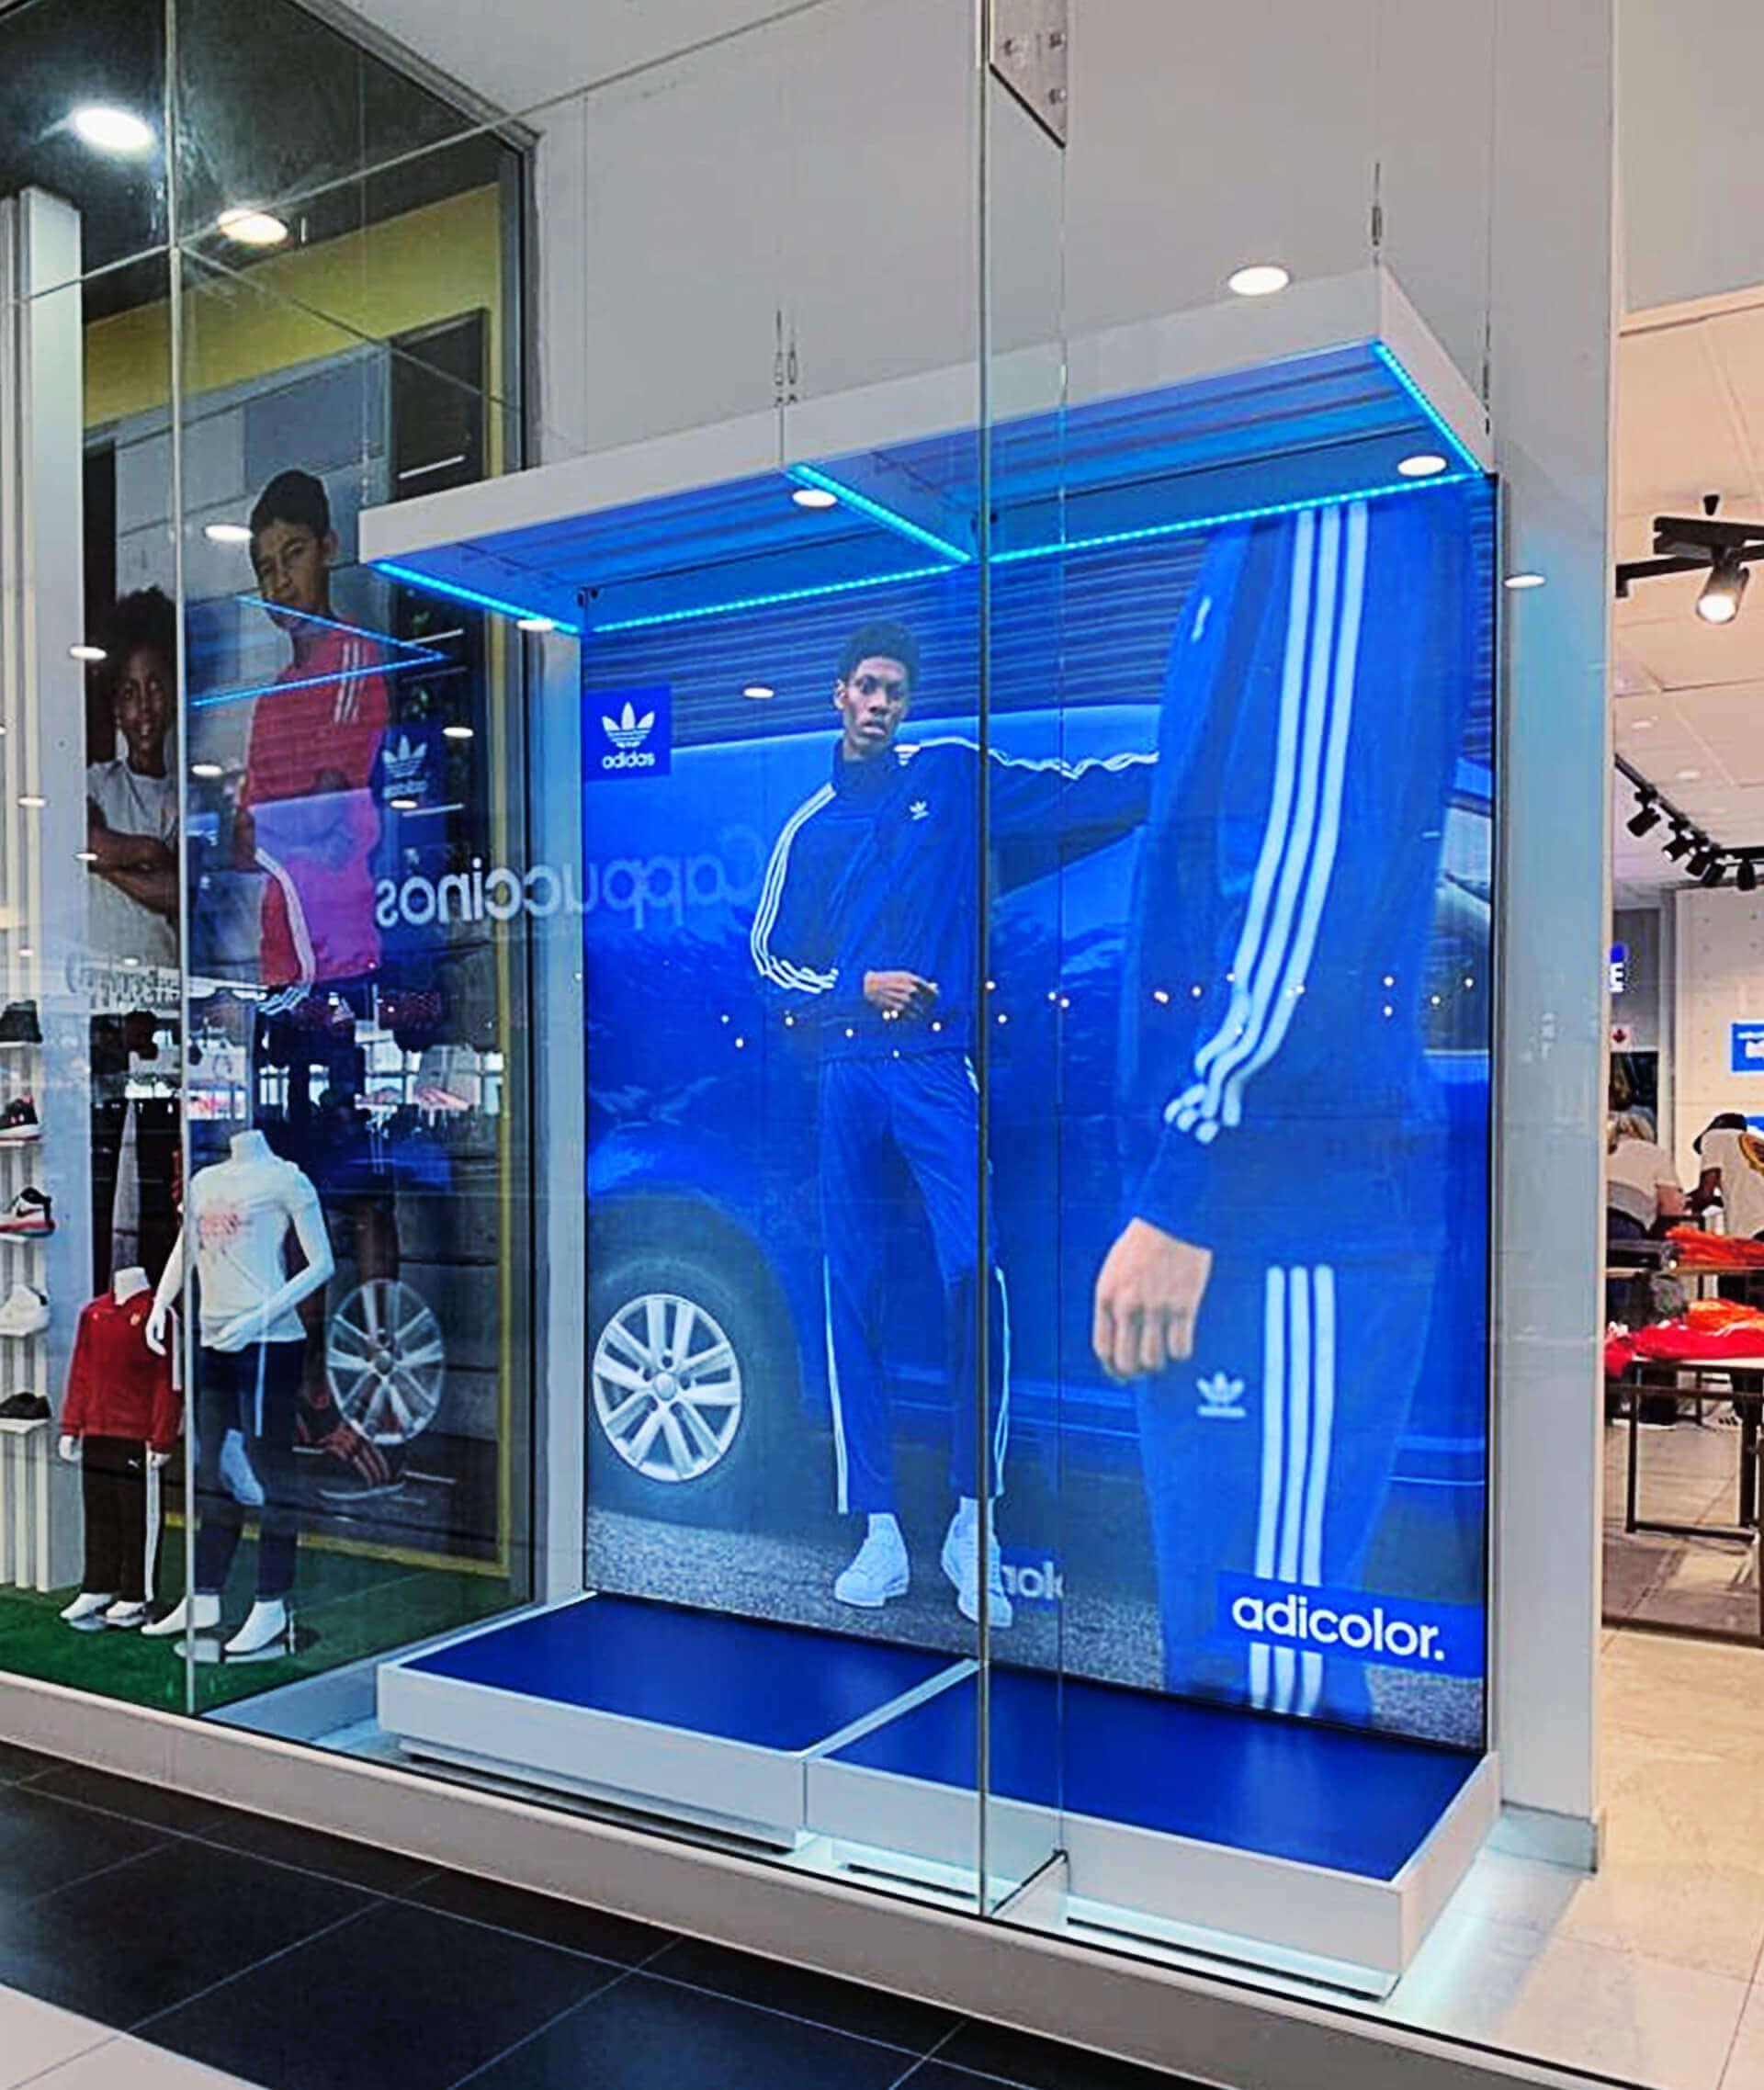 Adidas - Adi Colour - Window